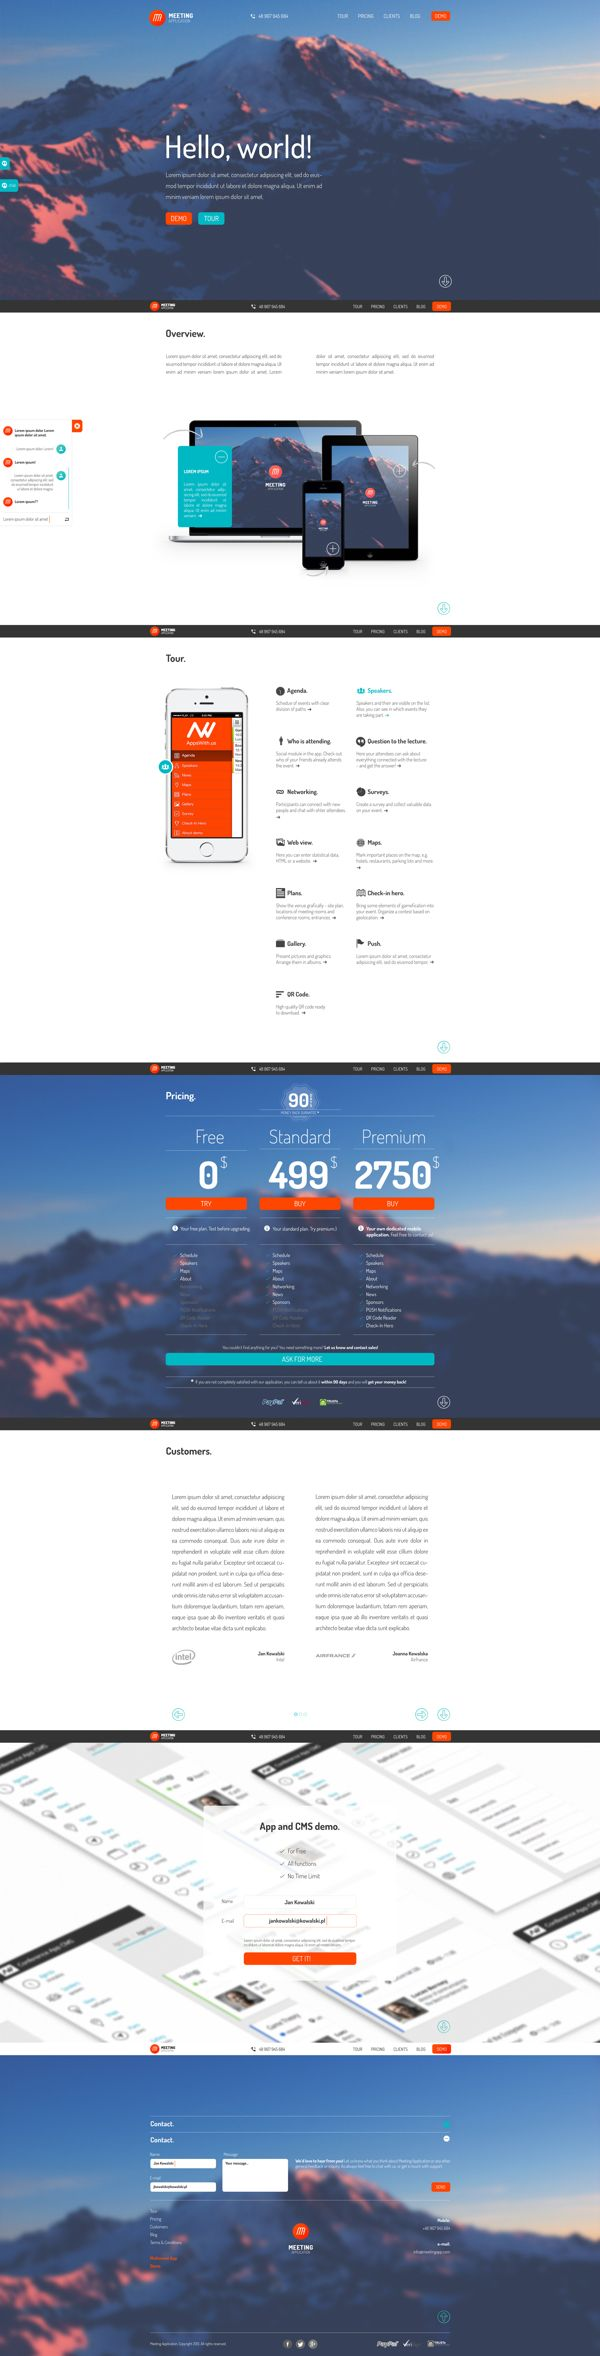 Meeting Application by Piotr Kozak, via Behance